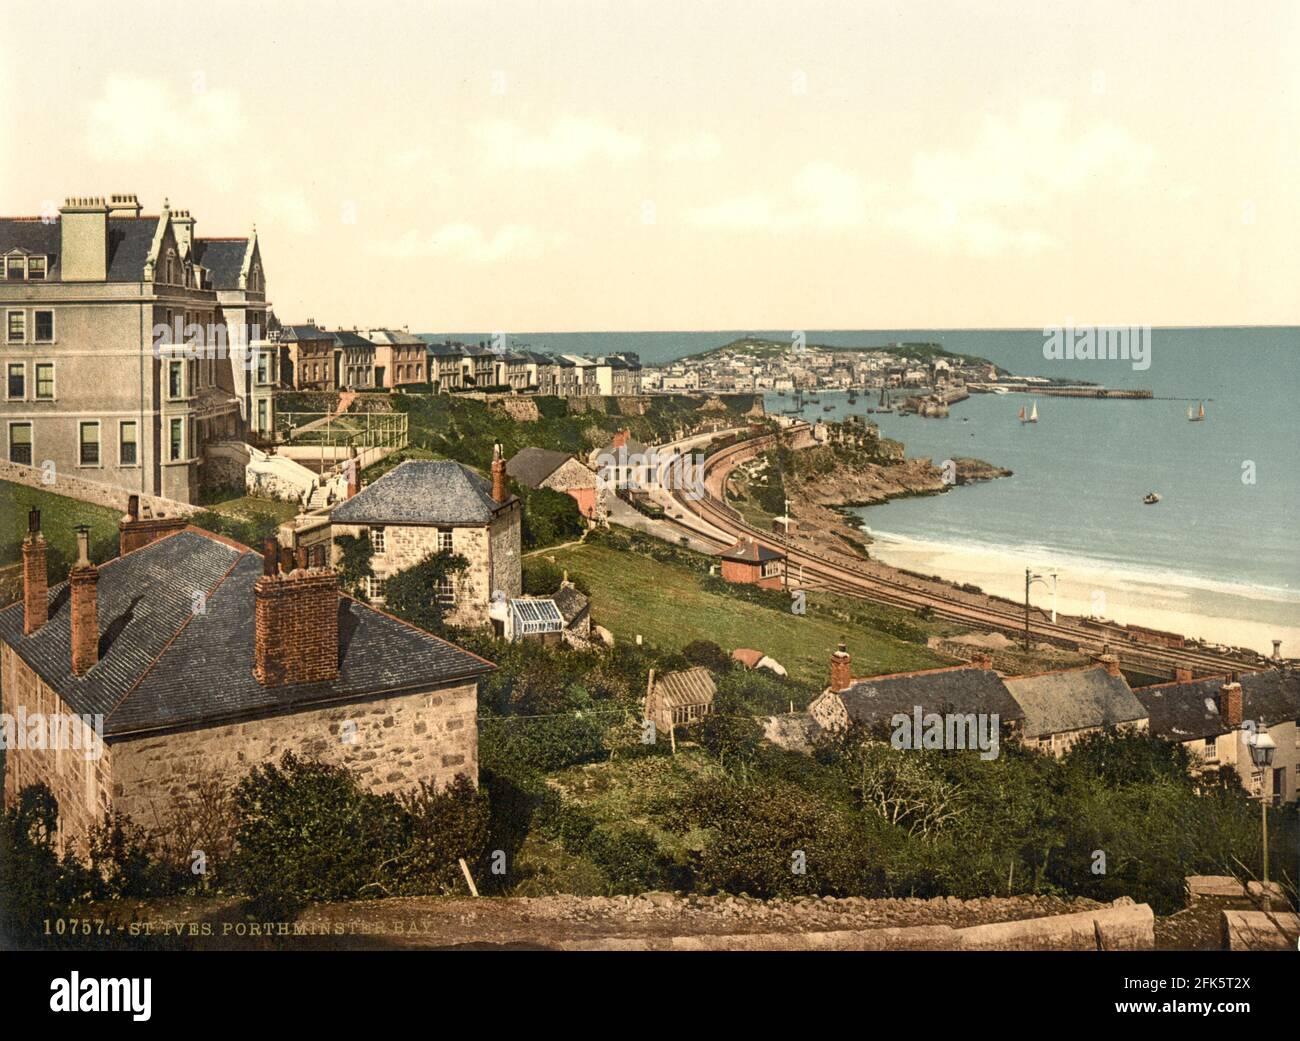 Porthminster Bay St Ives in Cornwall um 1890-1900 Stockfoto